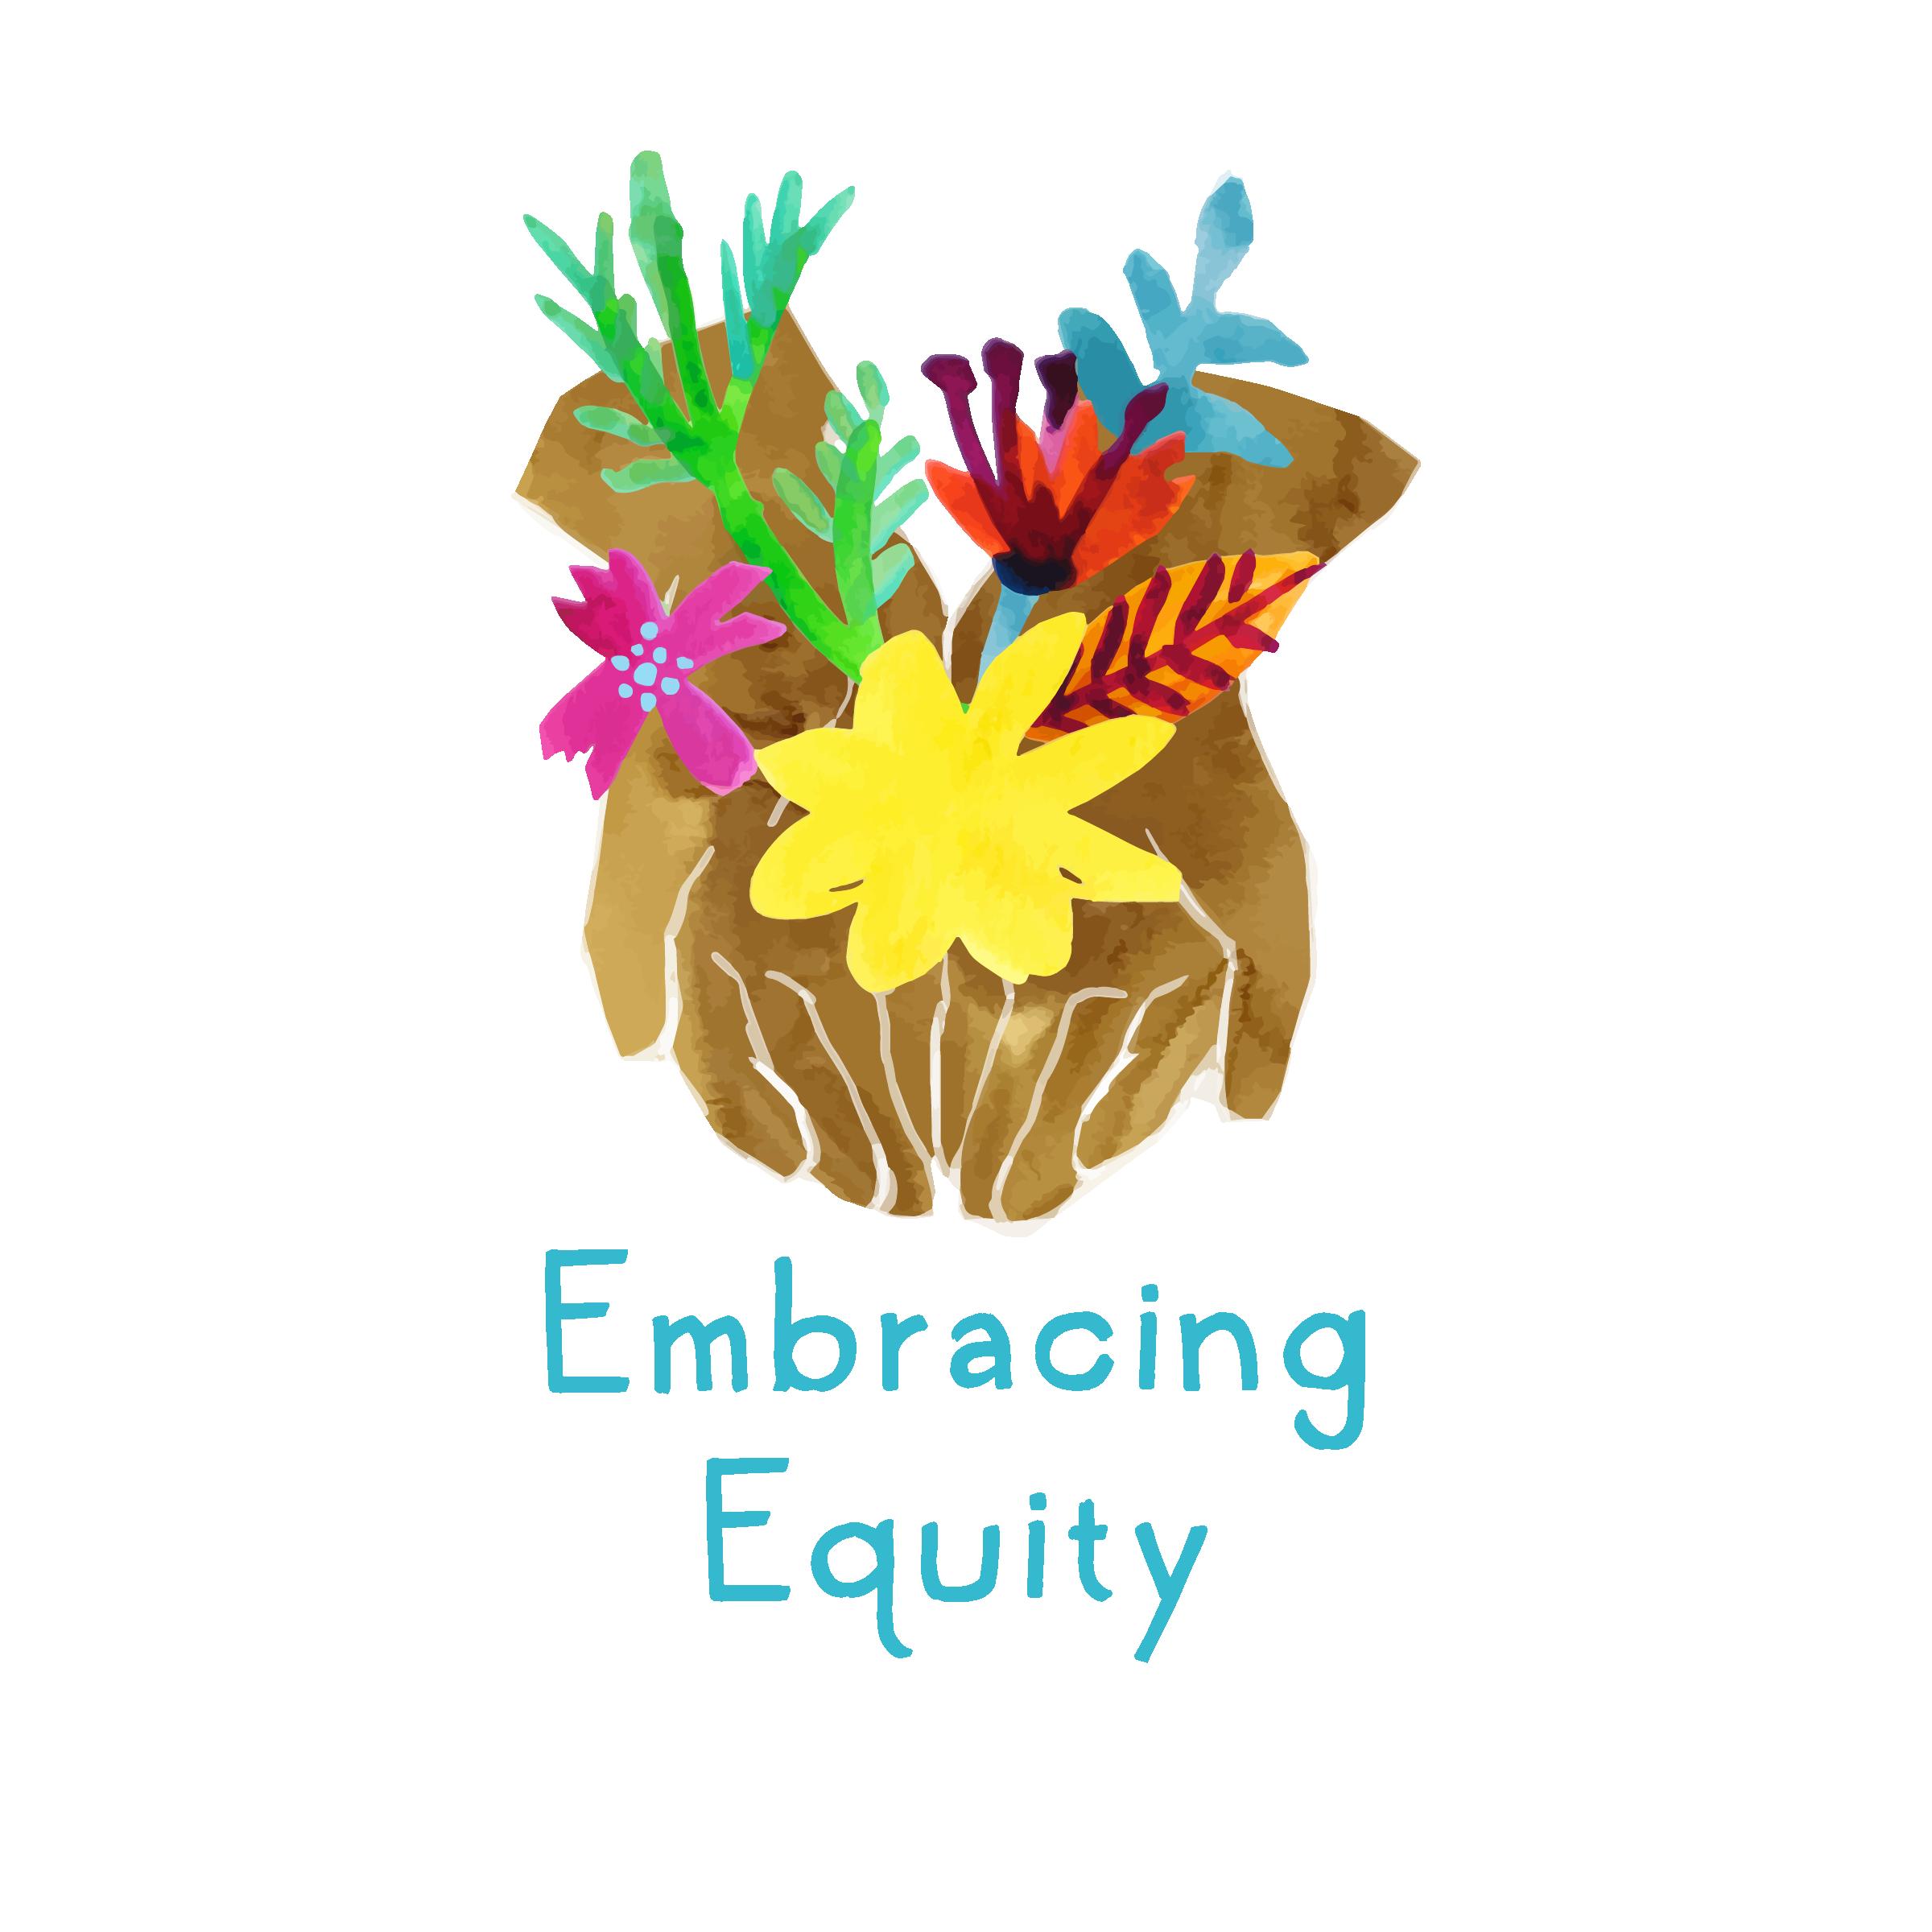 embracingEquity2-01 (2).png